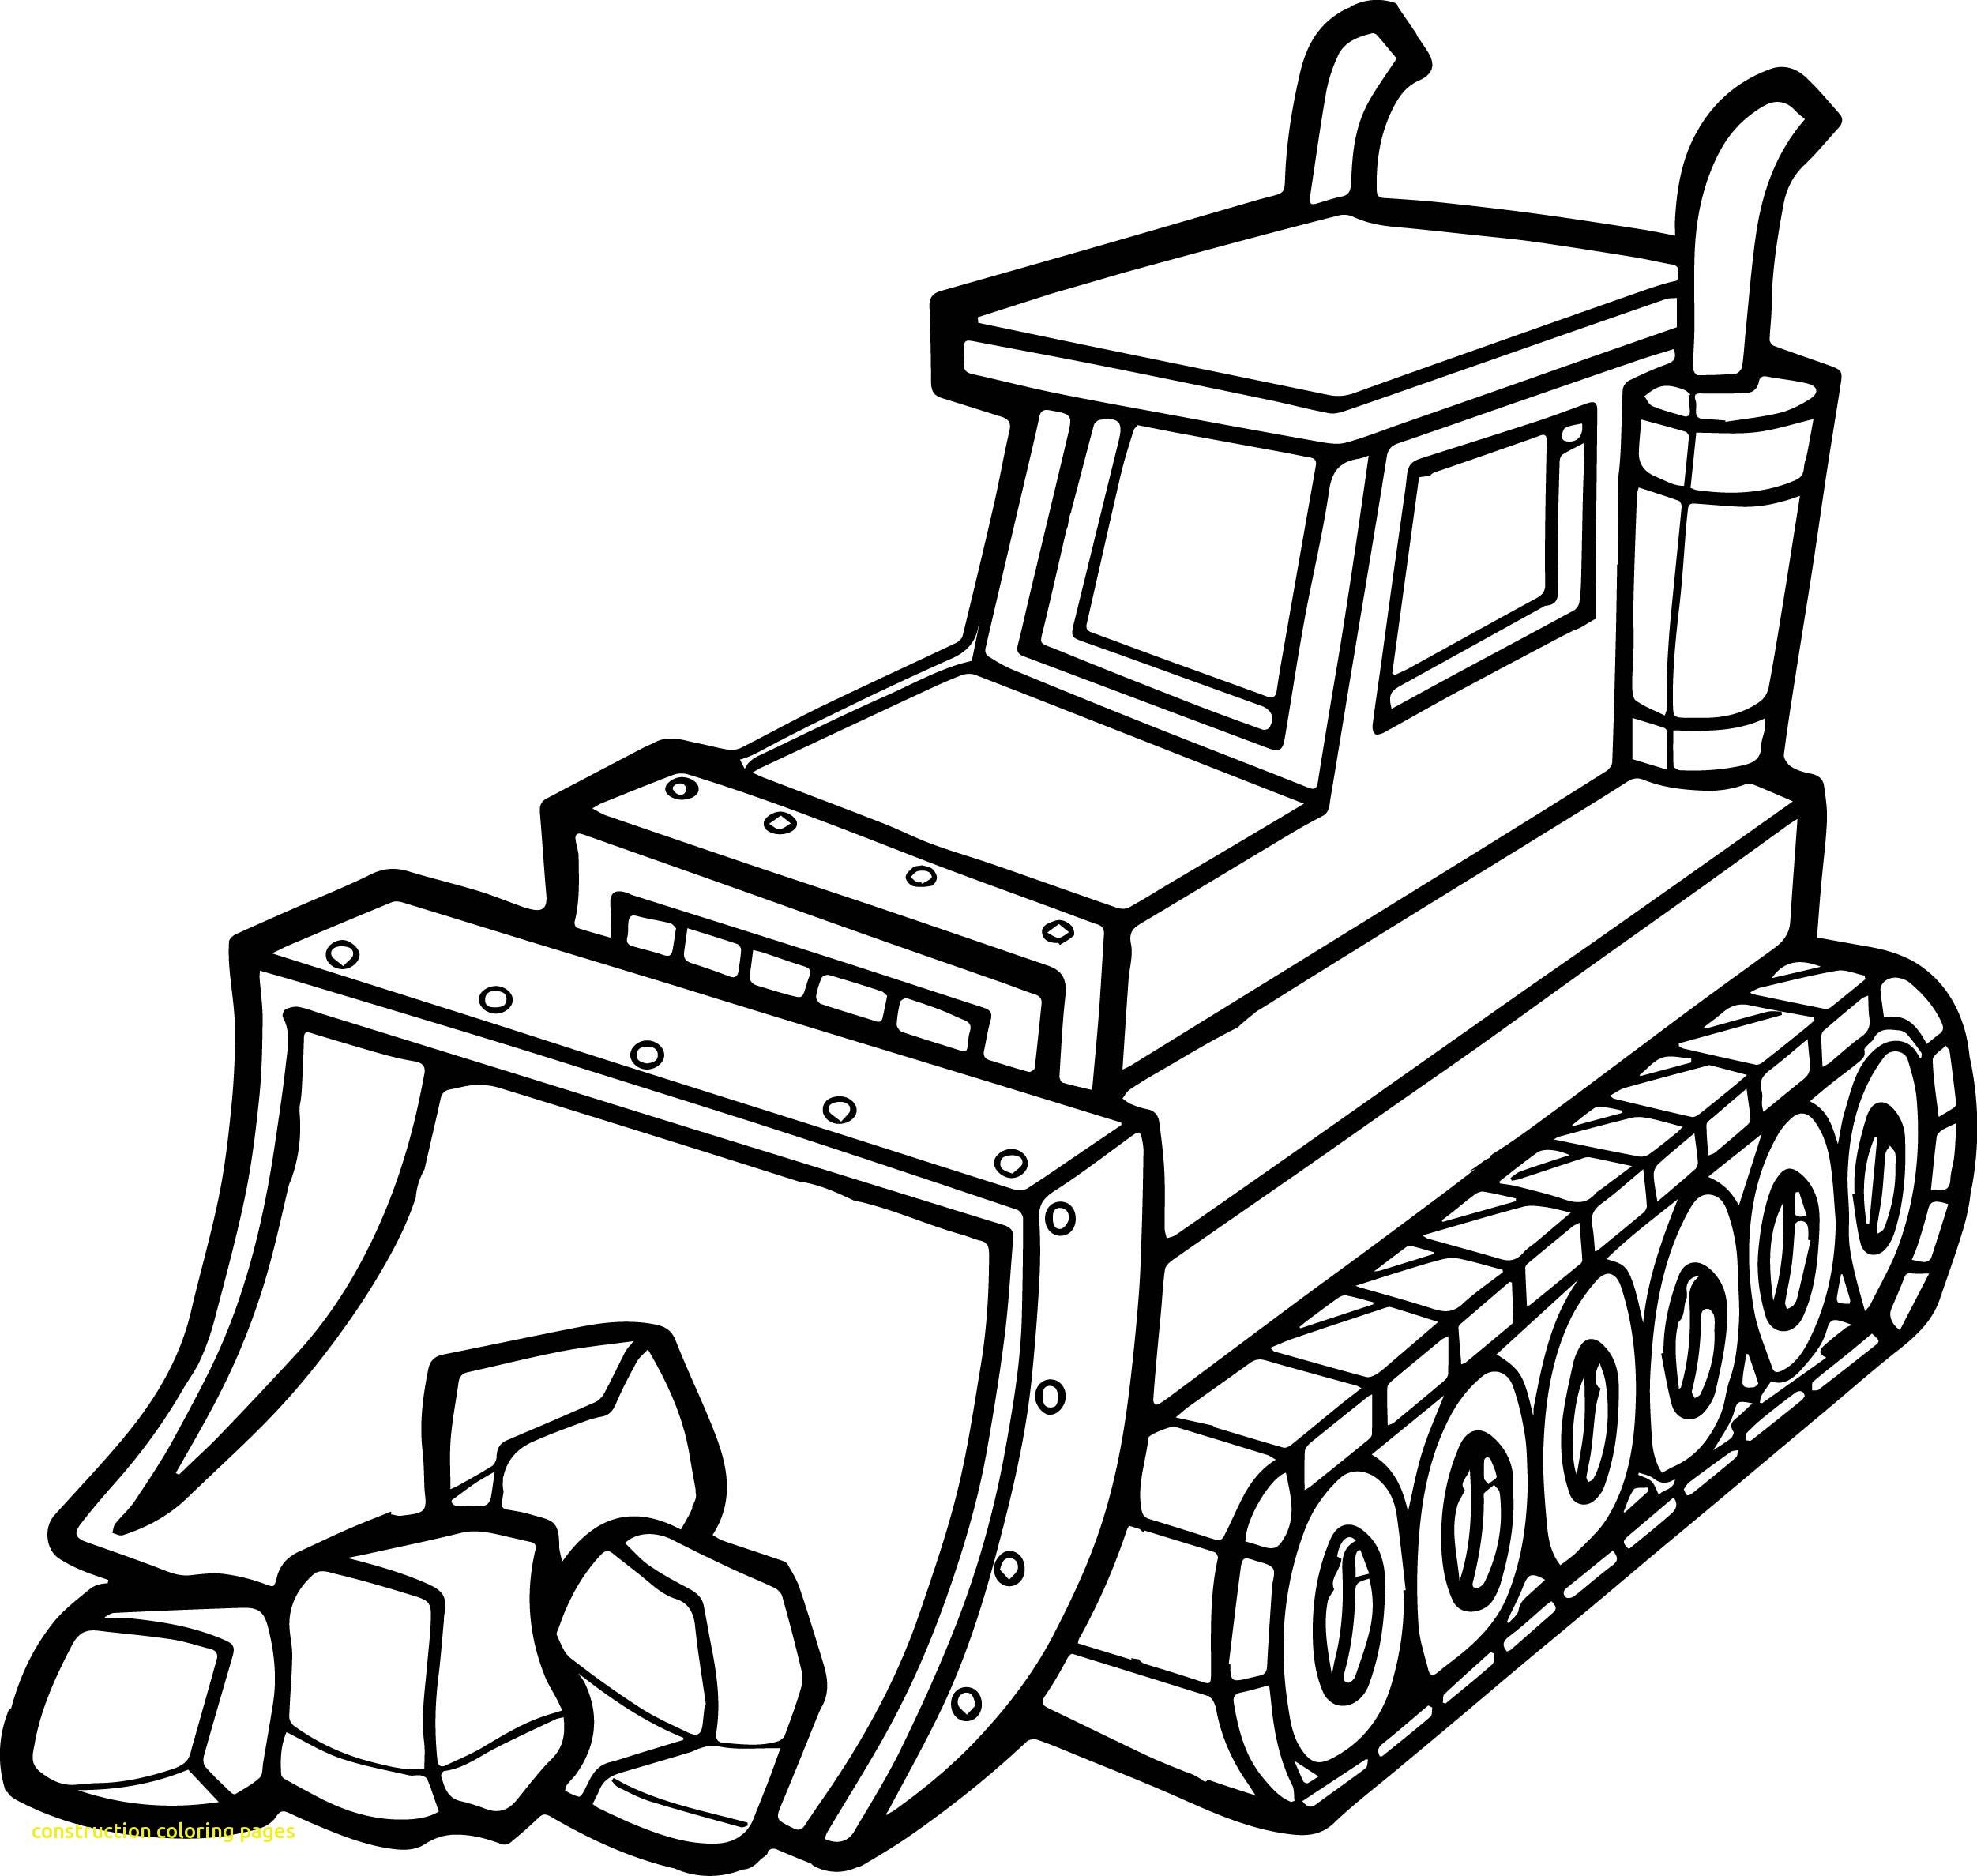 Bulldozer Clipart Black And White Bulldozer Black And